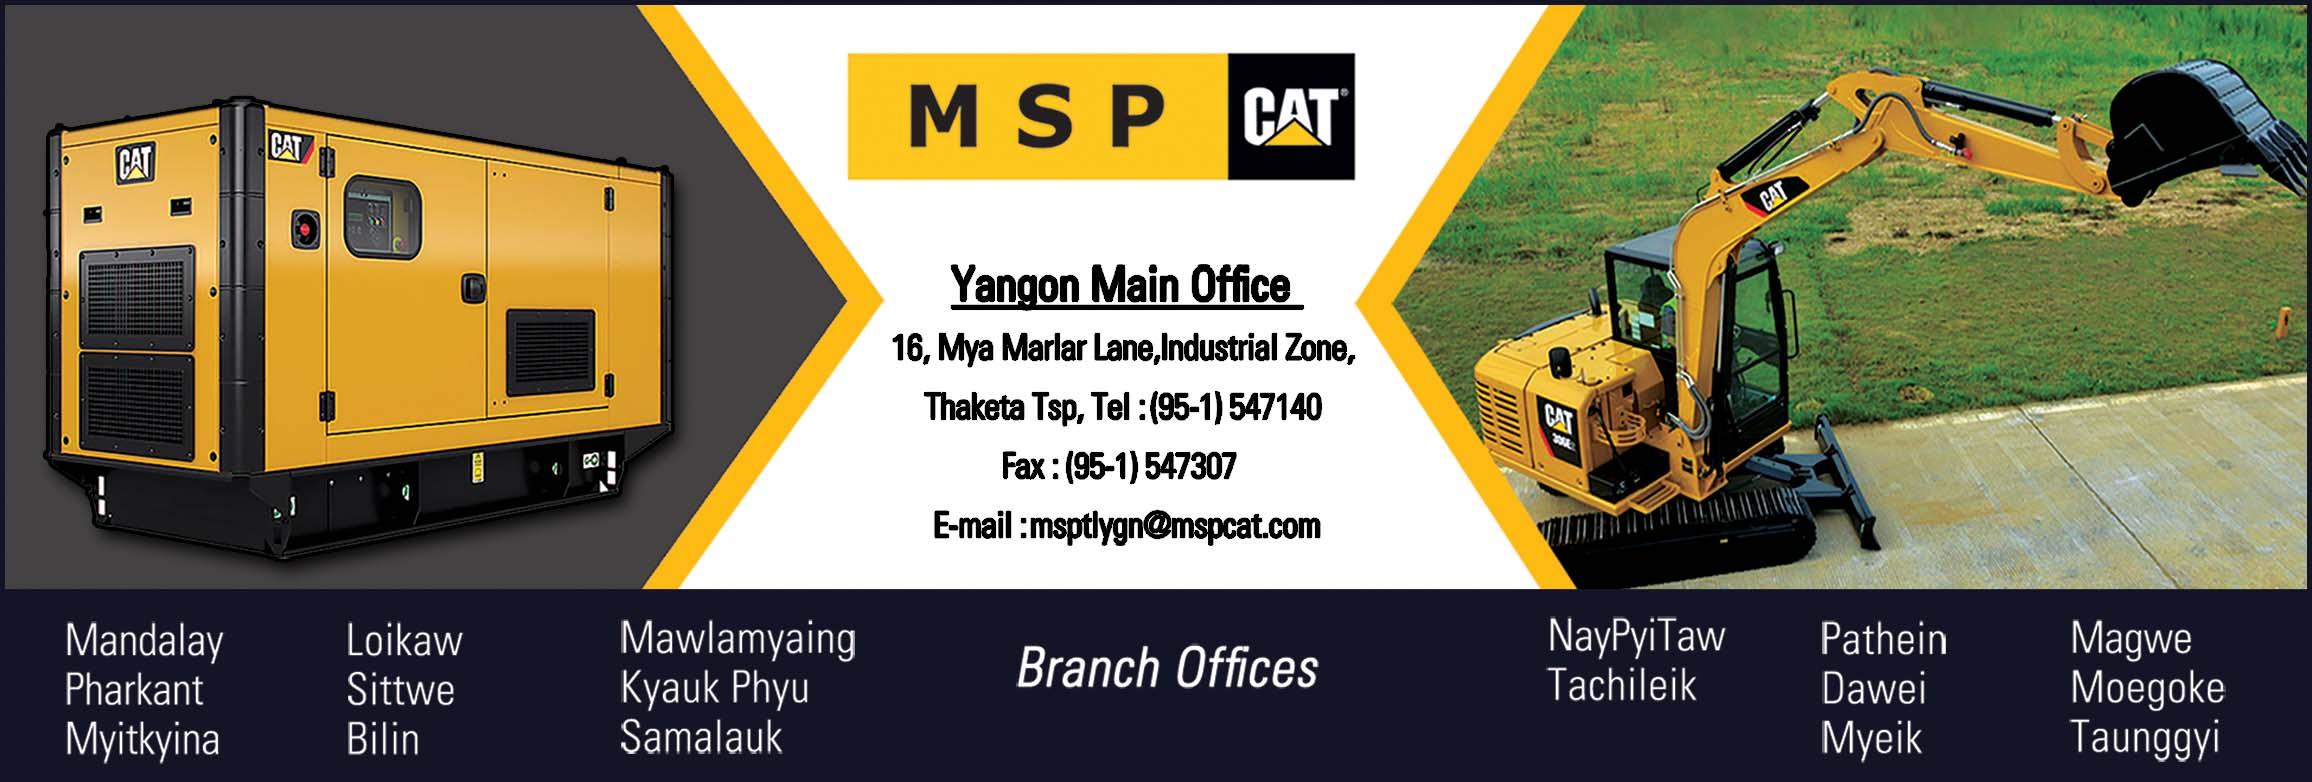 Myan Shwe Pyi Tractors Ltd. (MSP)